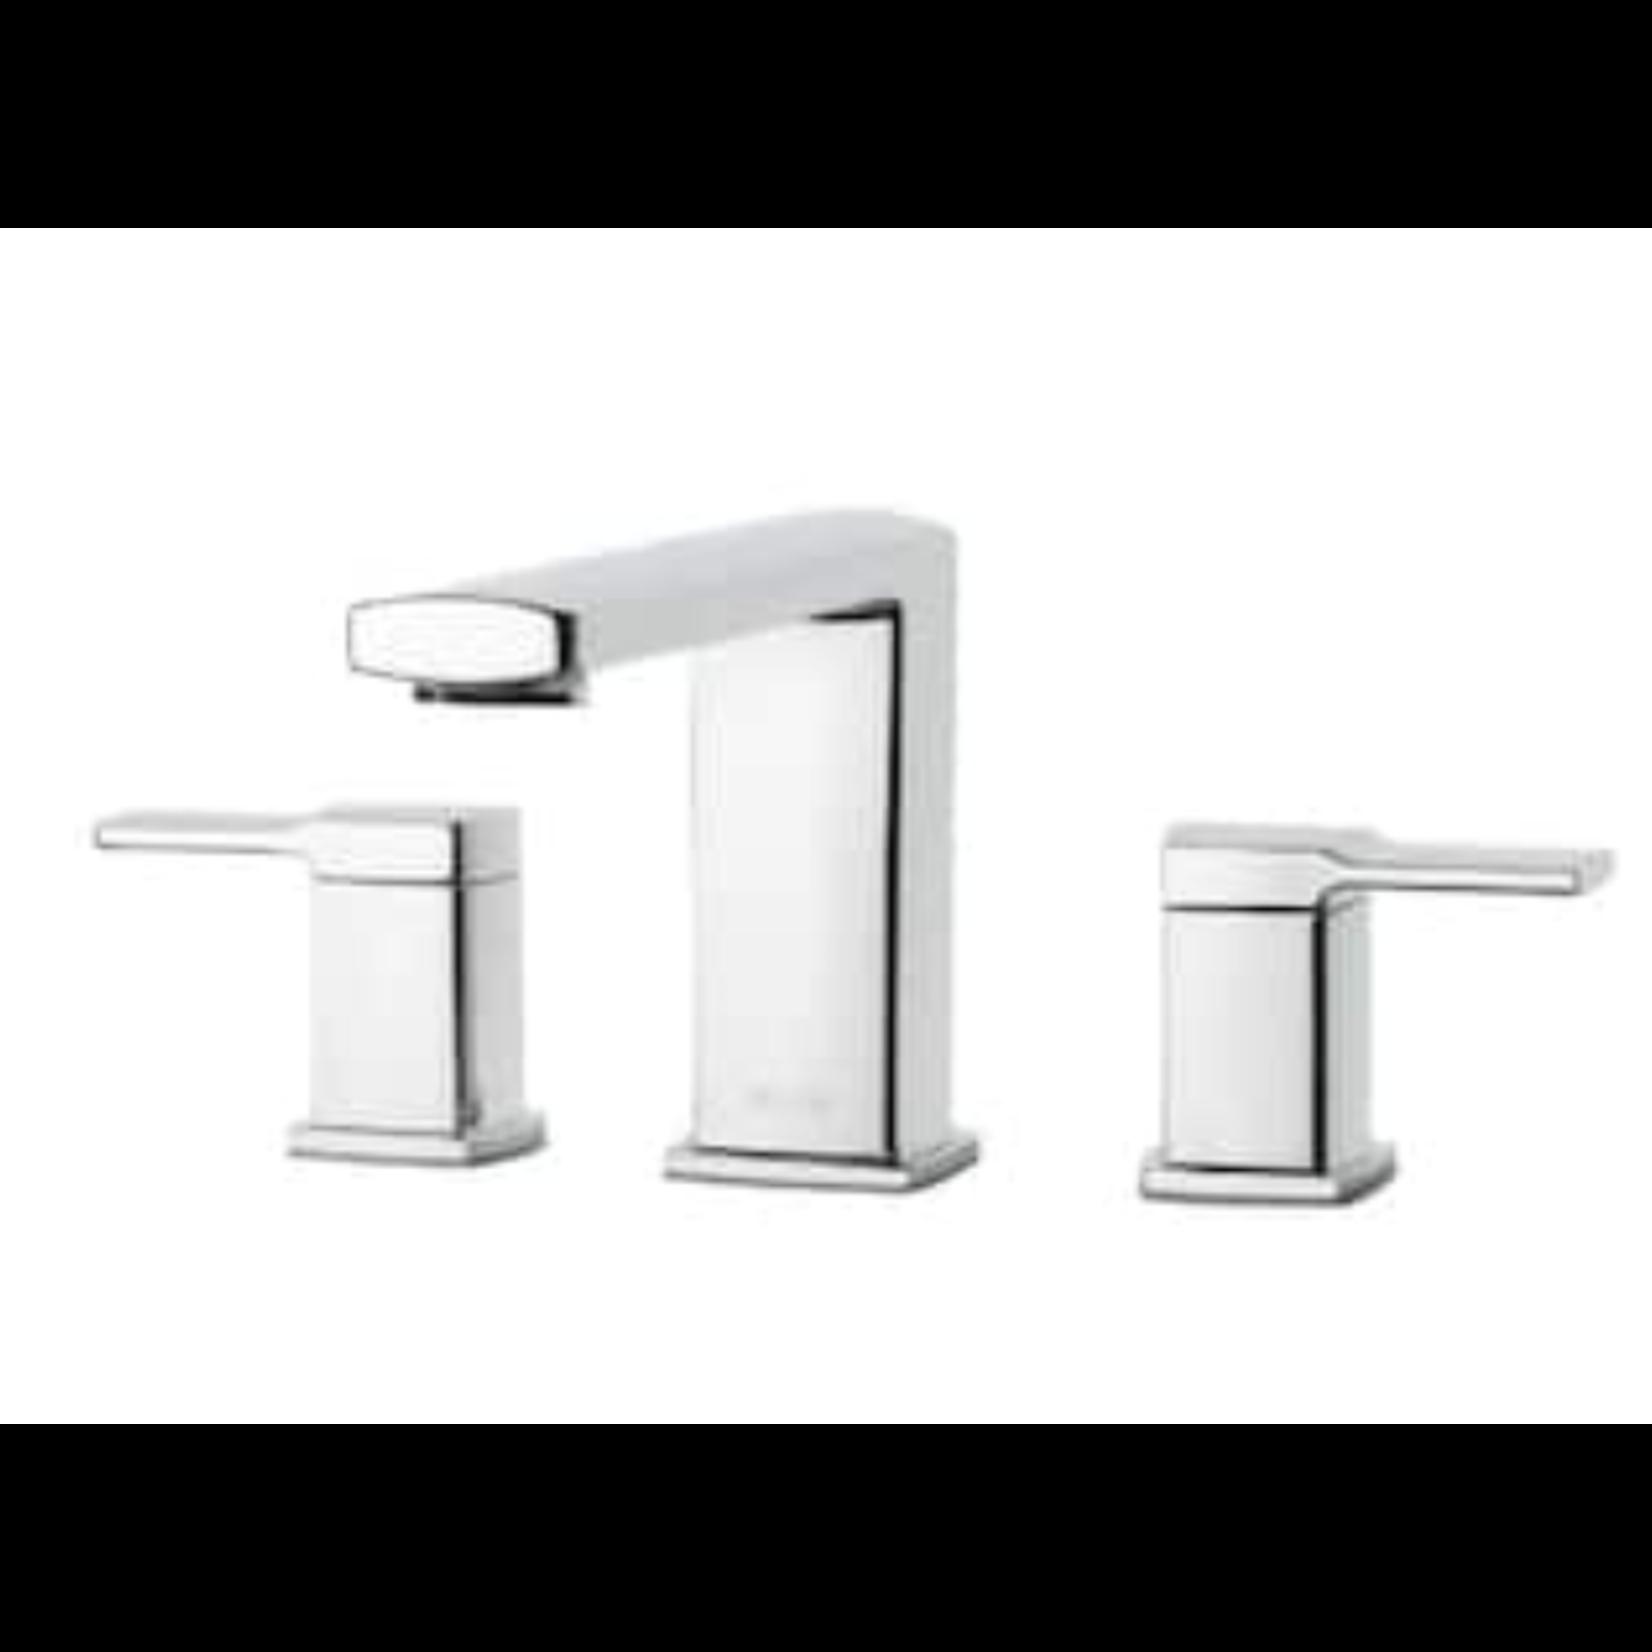 2909 Pfister Deckard Polished Chrome 2-Handle Roman Bathtub Faucet